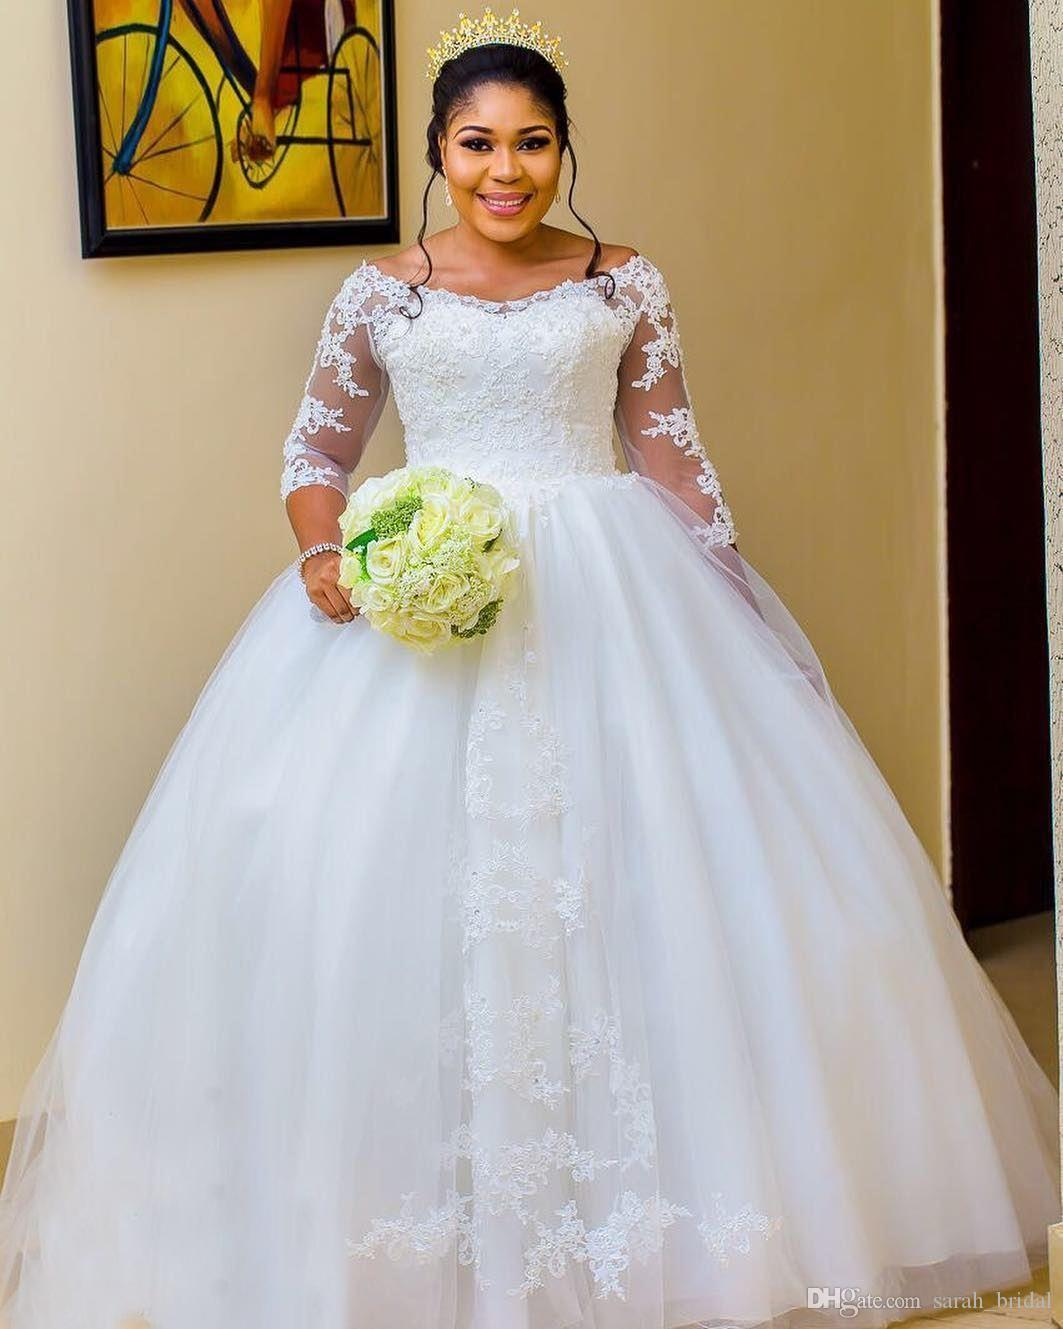 Bellanaija Nigeria Long Sleeves Wedding Dresses 2020 Ball Gown Plus Size  Off Shoulder Vintage Lace Black Girls Arabic Wedding Bridal Gown Wedding ...